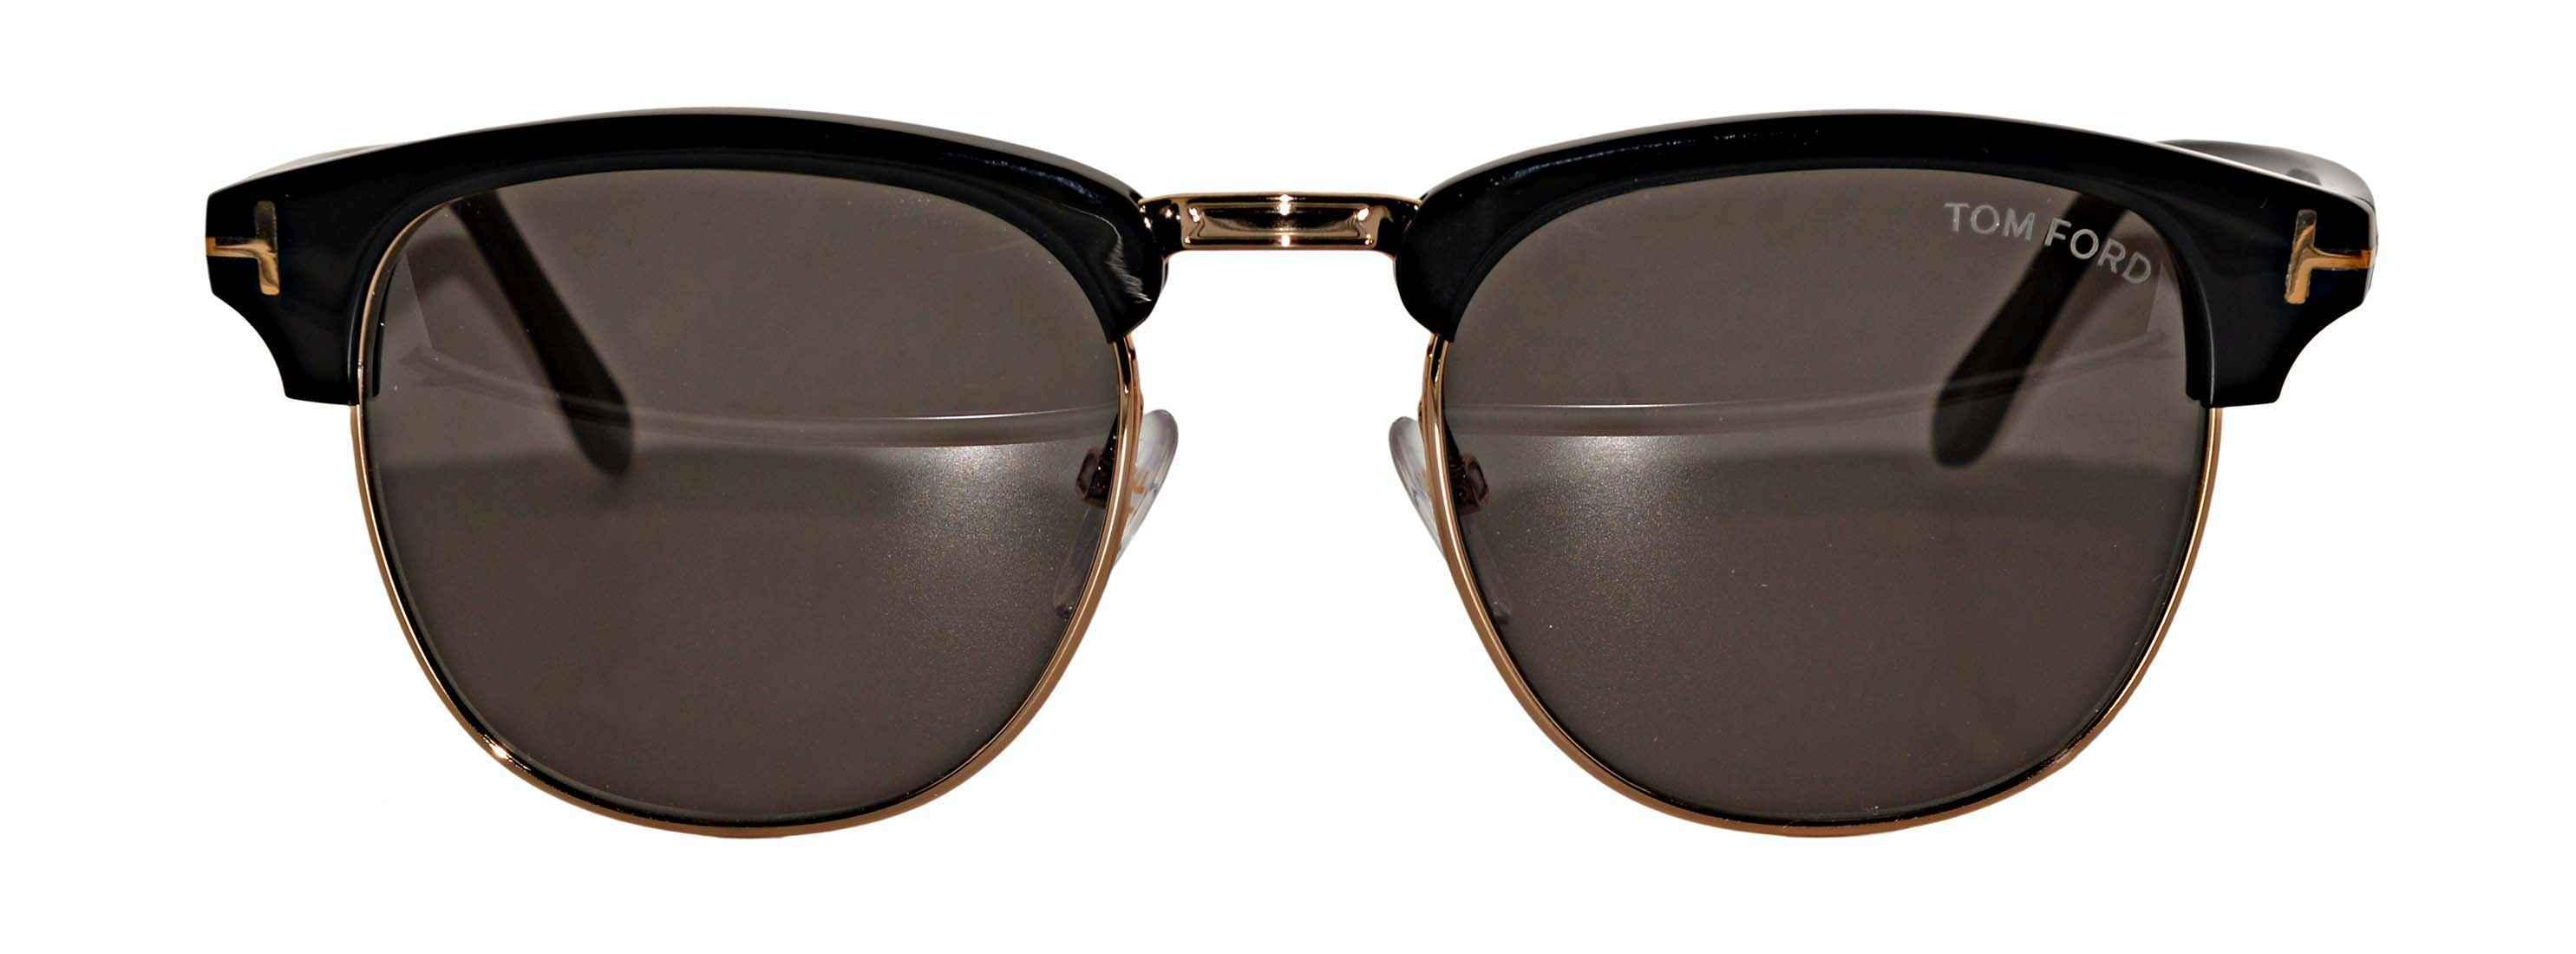 Tom Ford Sunglasses 248 5n 1 2970x1100